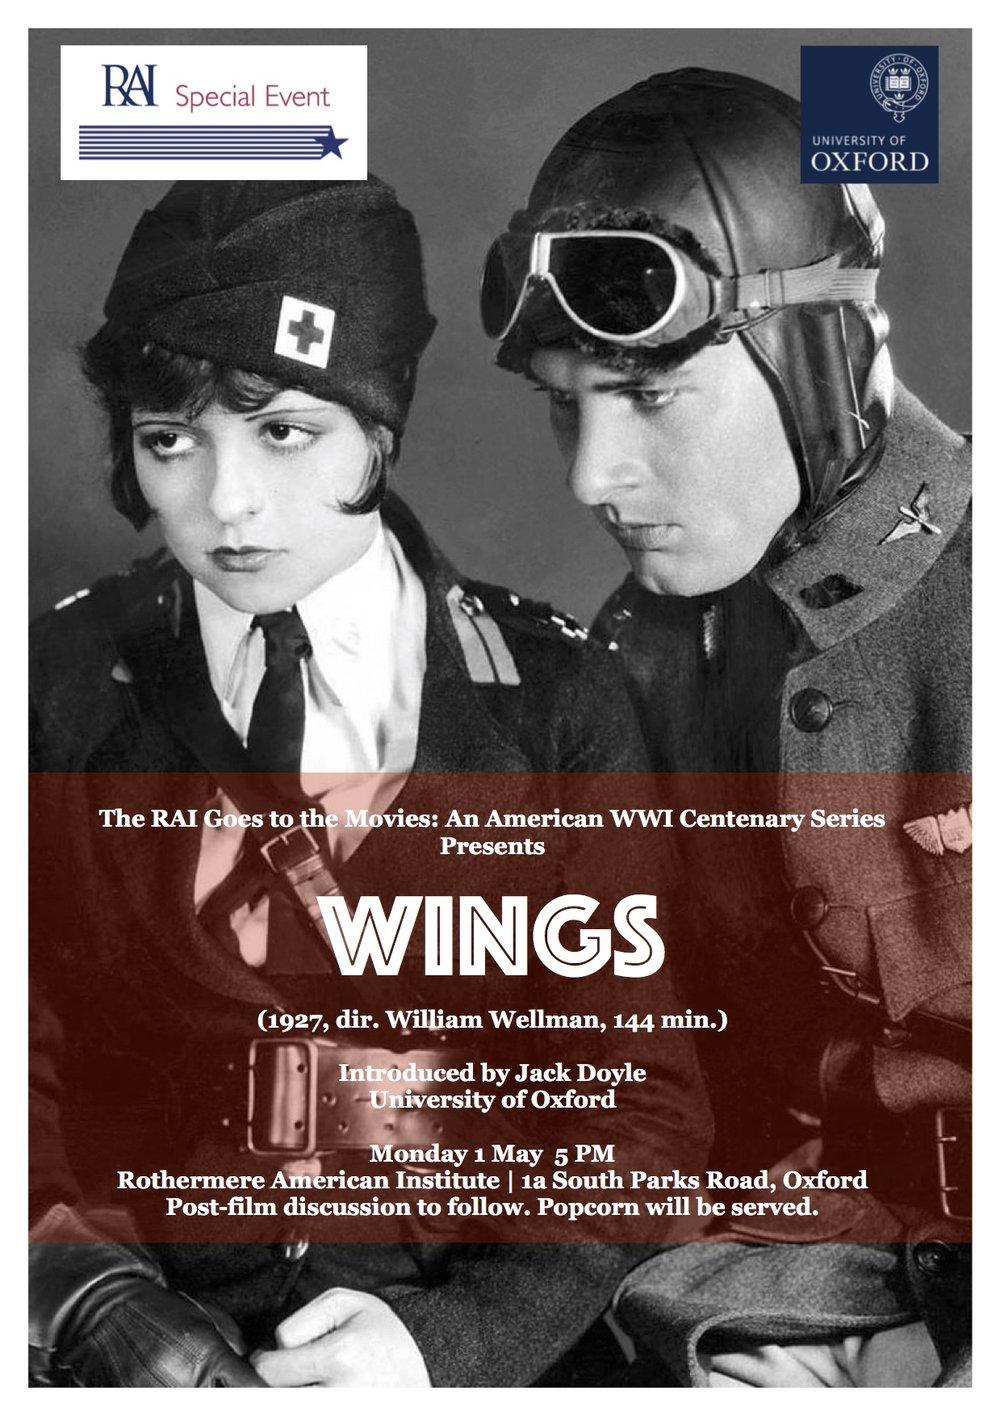 RAI Goes to the Movies - Wings.jpg